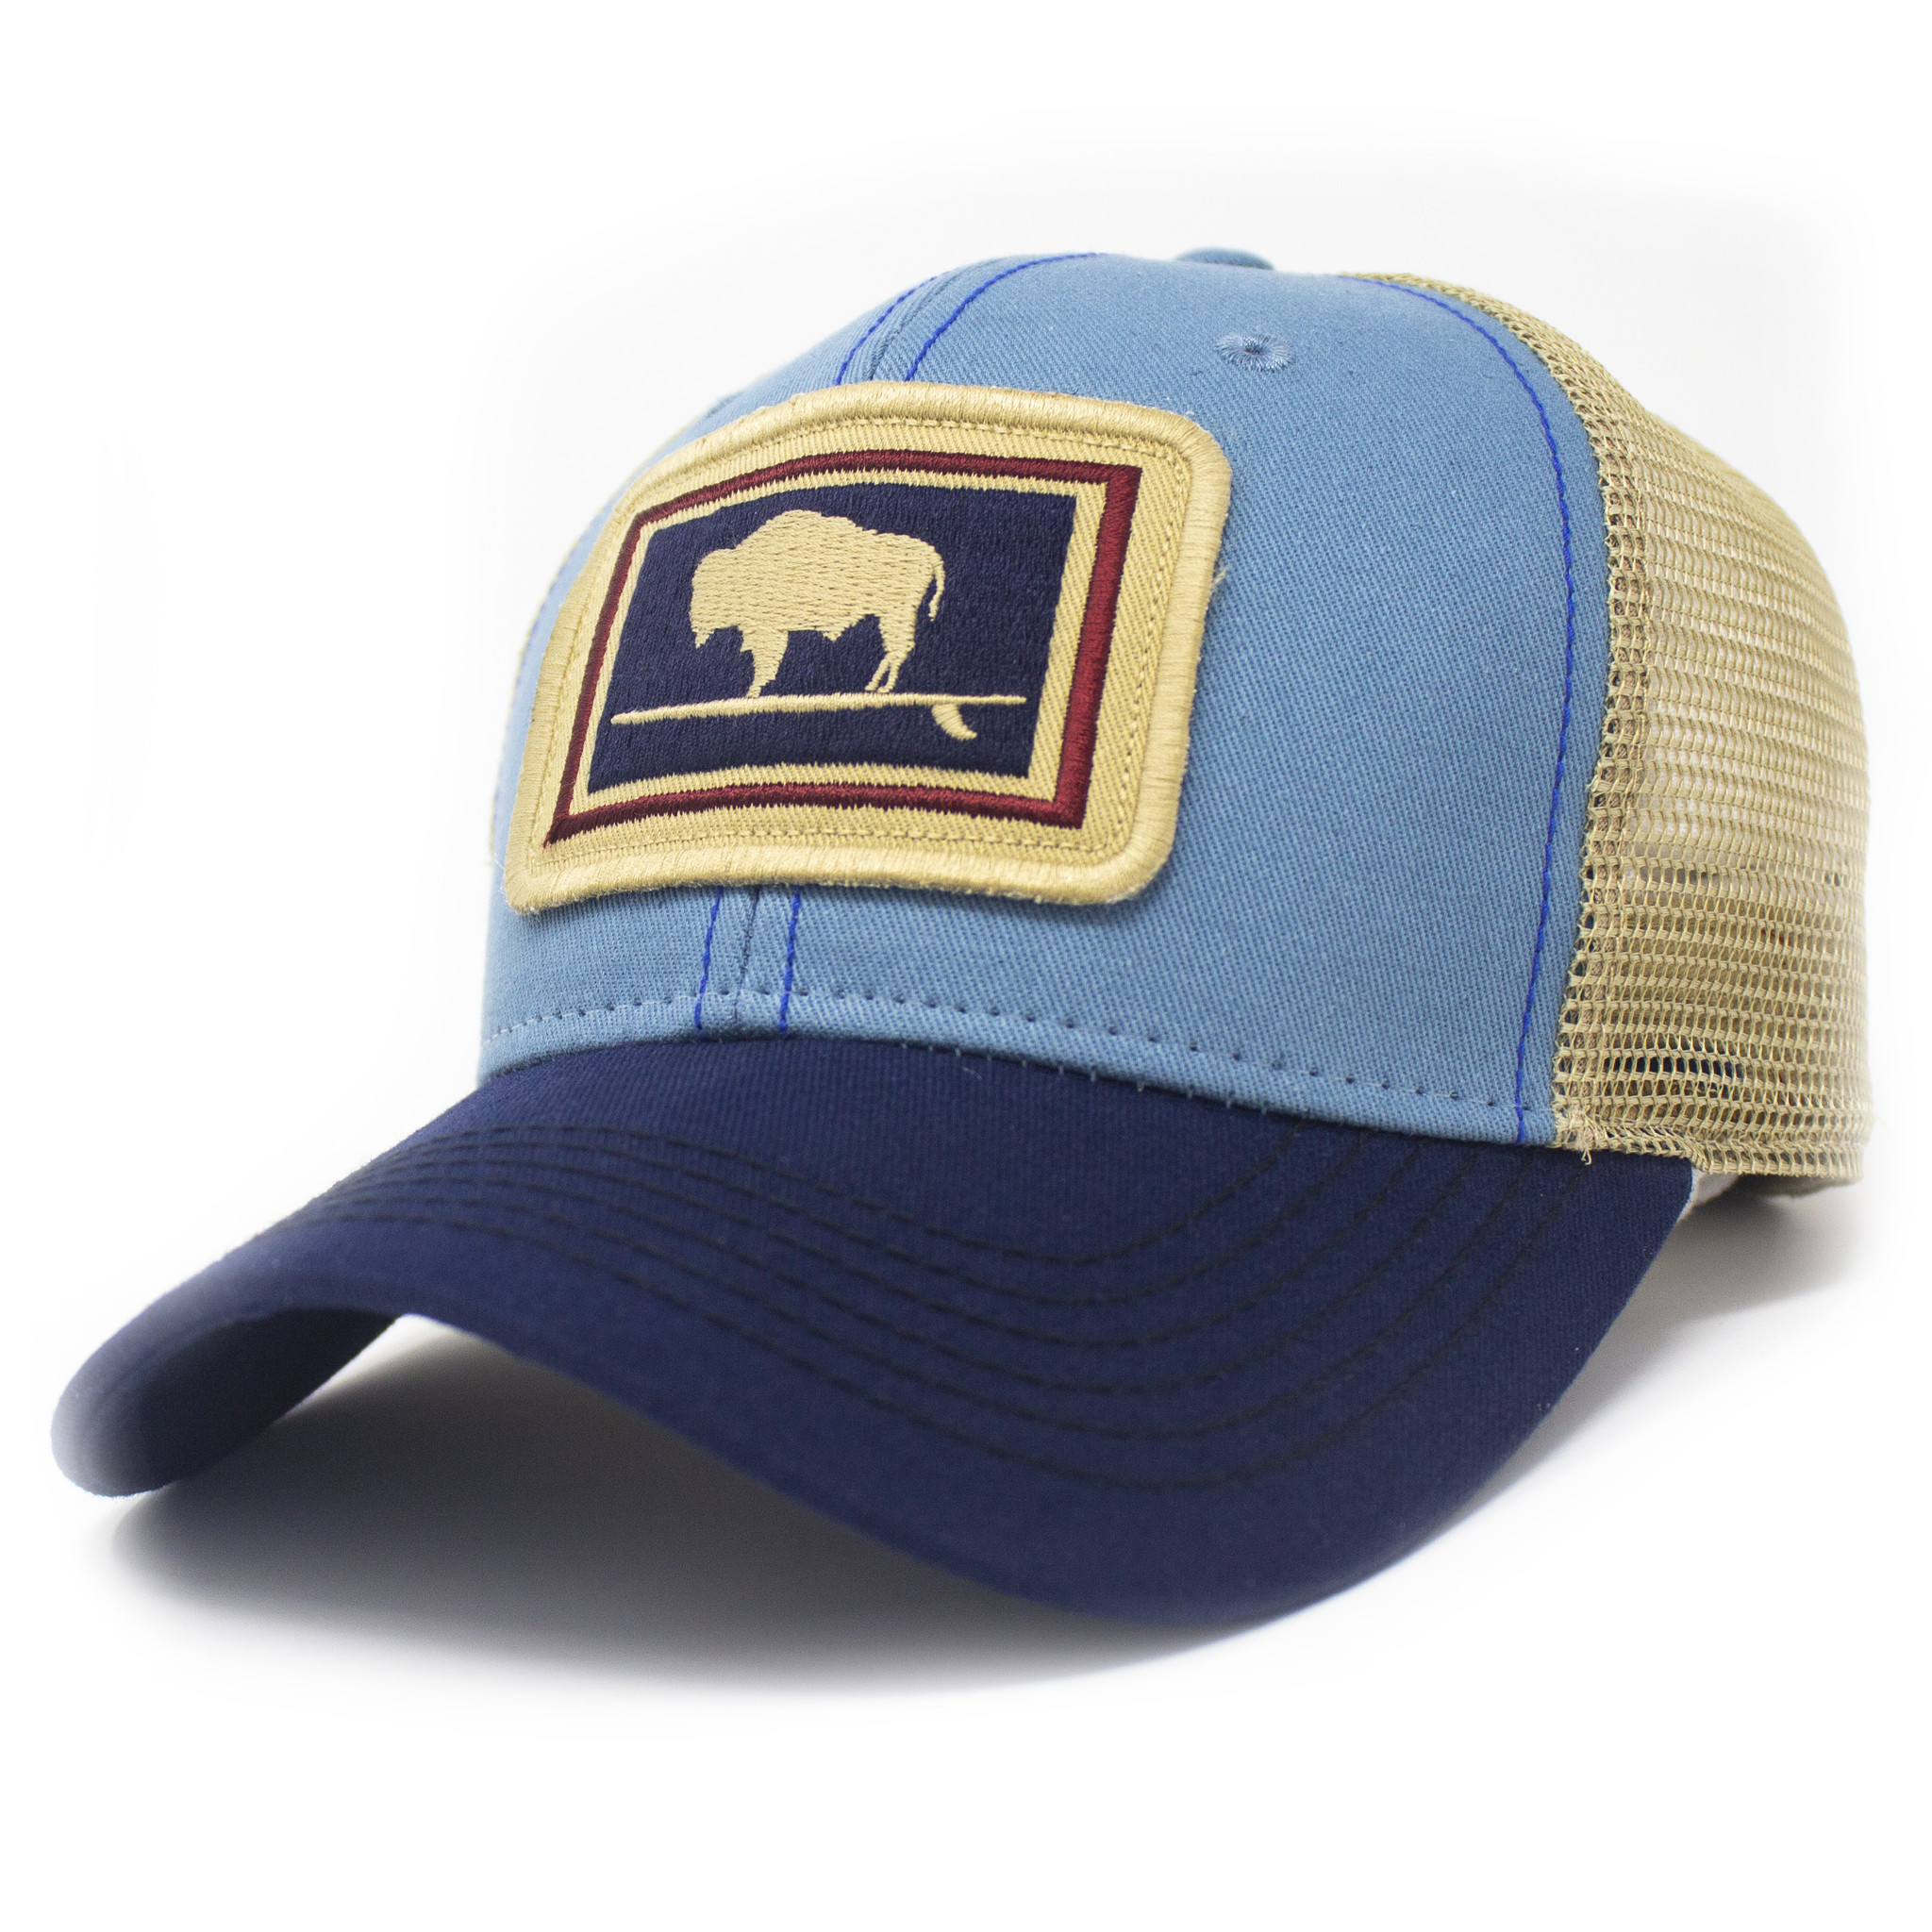 Surfing Buffalo Everyday Trucker Hat Structured, Blue-1